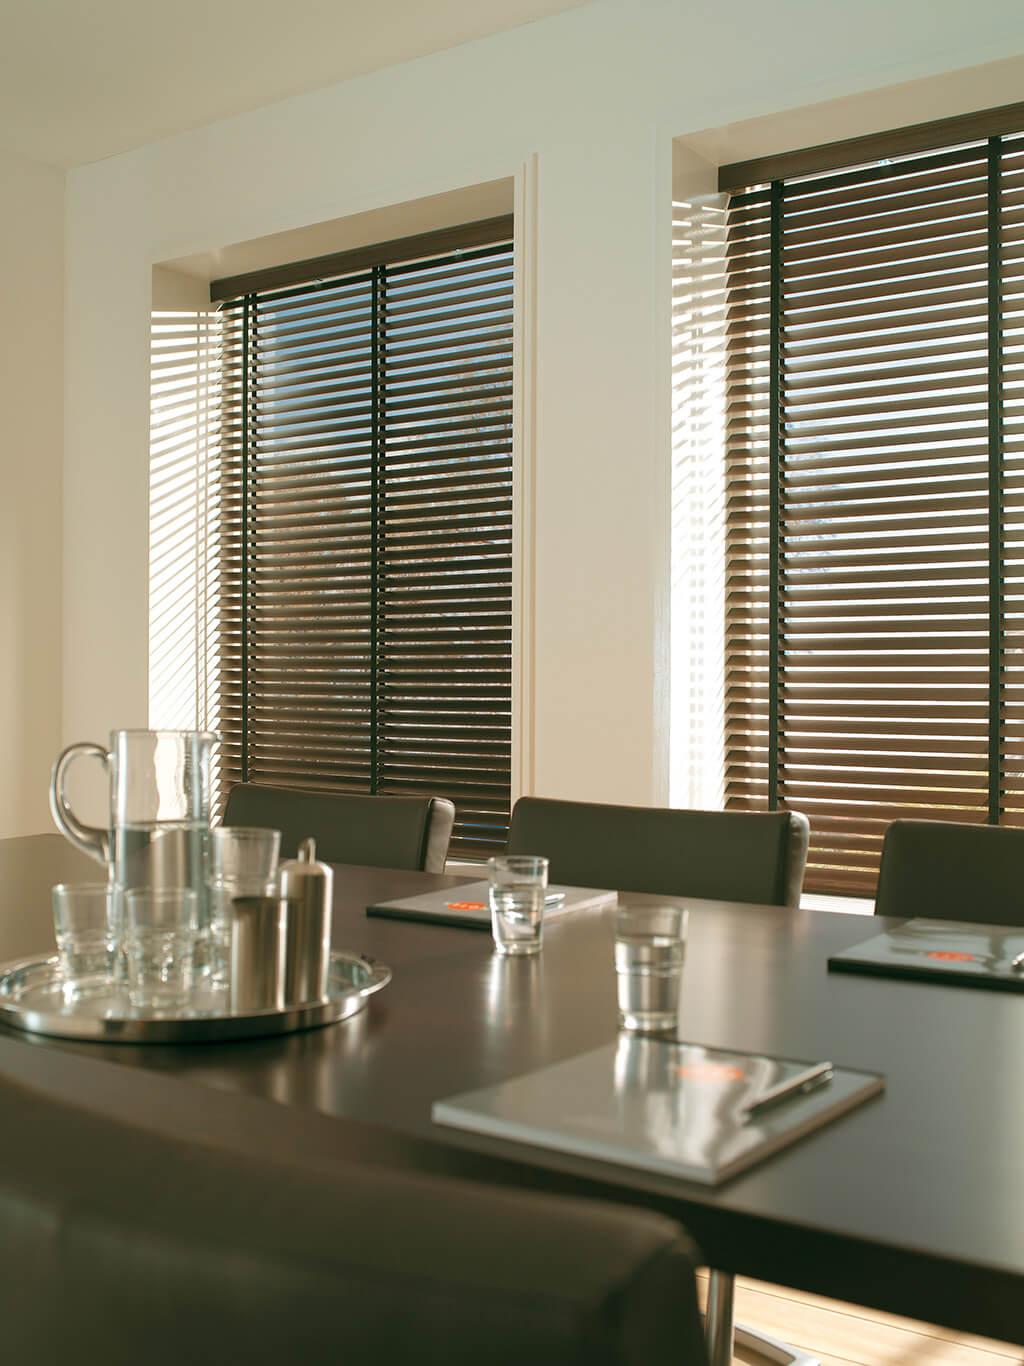 Klassiche Optik im Meetingraum, mit Holz-Jalousien